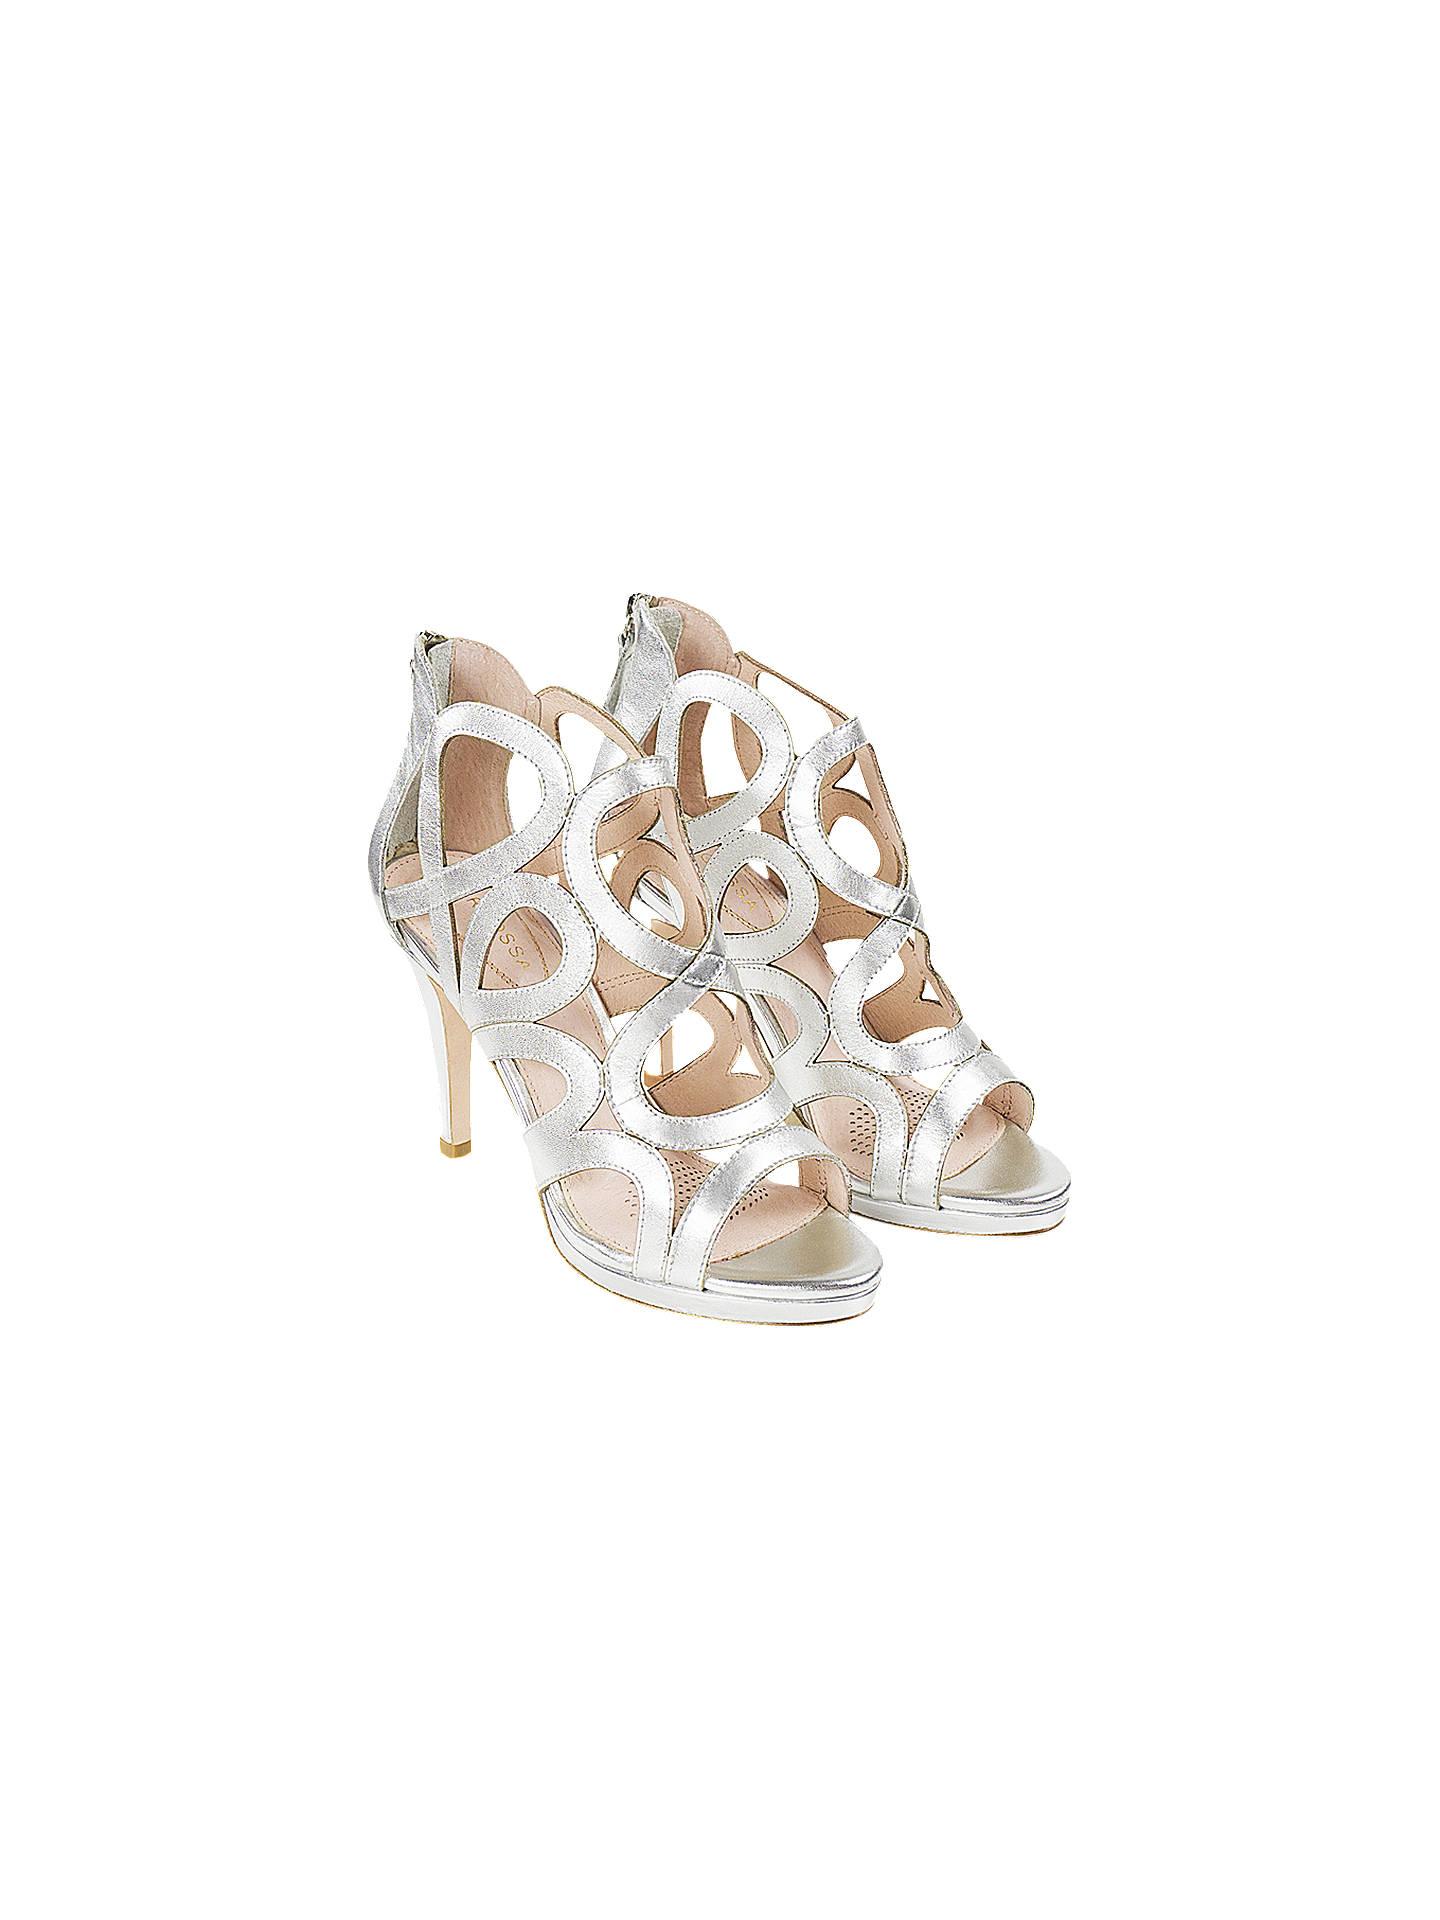 a40fd0f9b215 ... Buy Sargossa Redefined Stiletto Heel Sandals, Silver Leather, 8 Online  at johnlewis.com ...